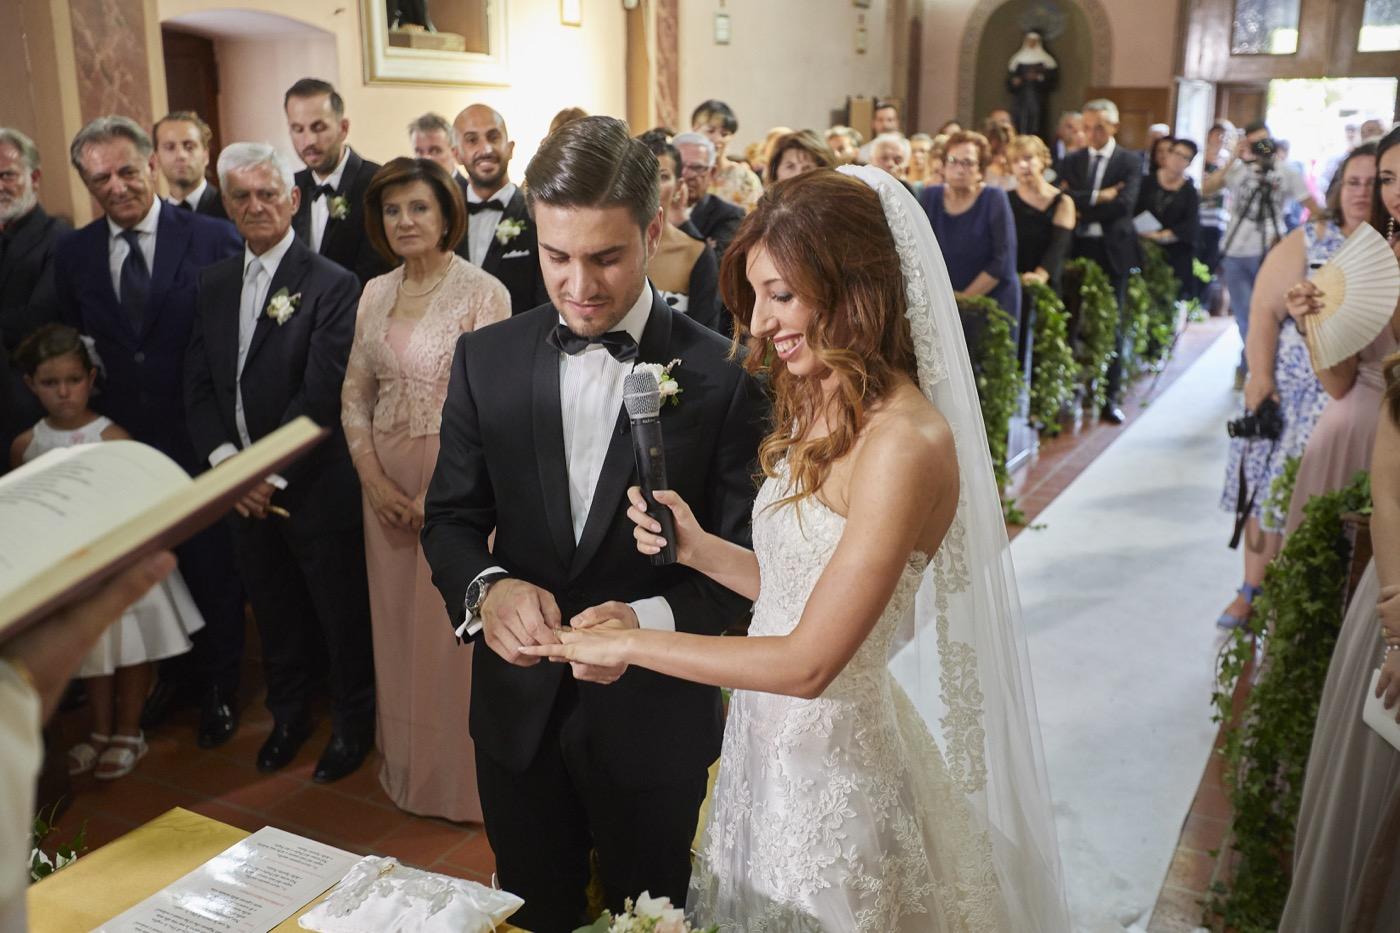 Claudio-Coppola-wedding-photographer-abbazia-7-frati-piegaro-48